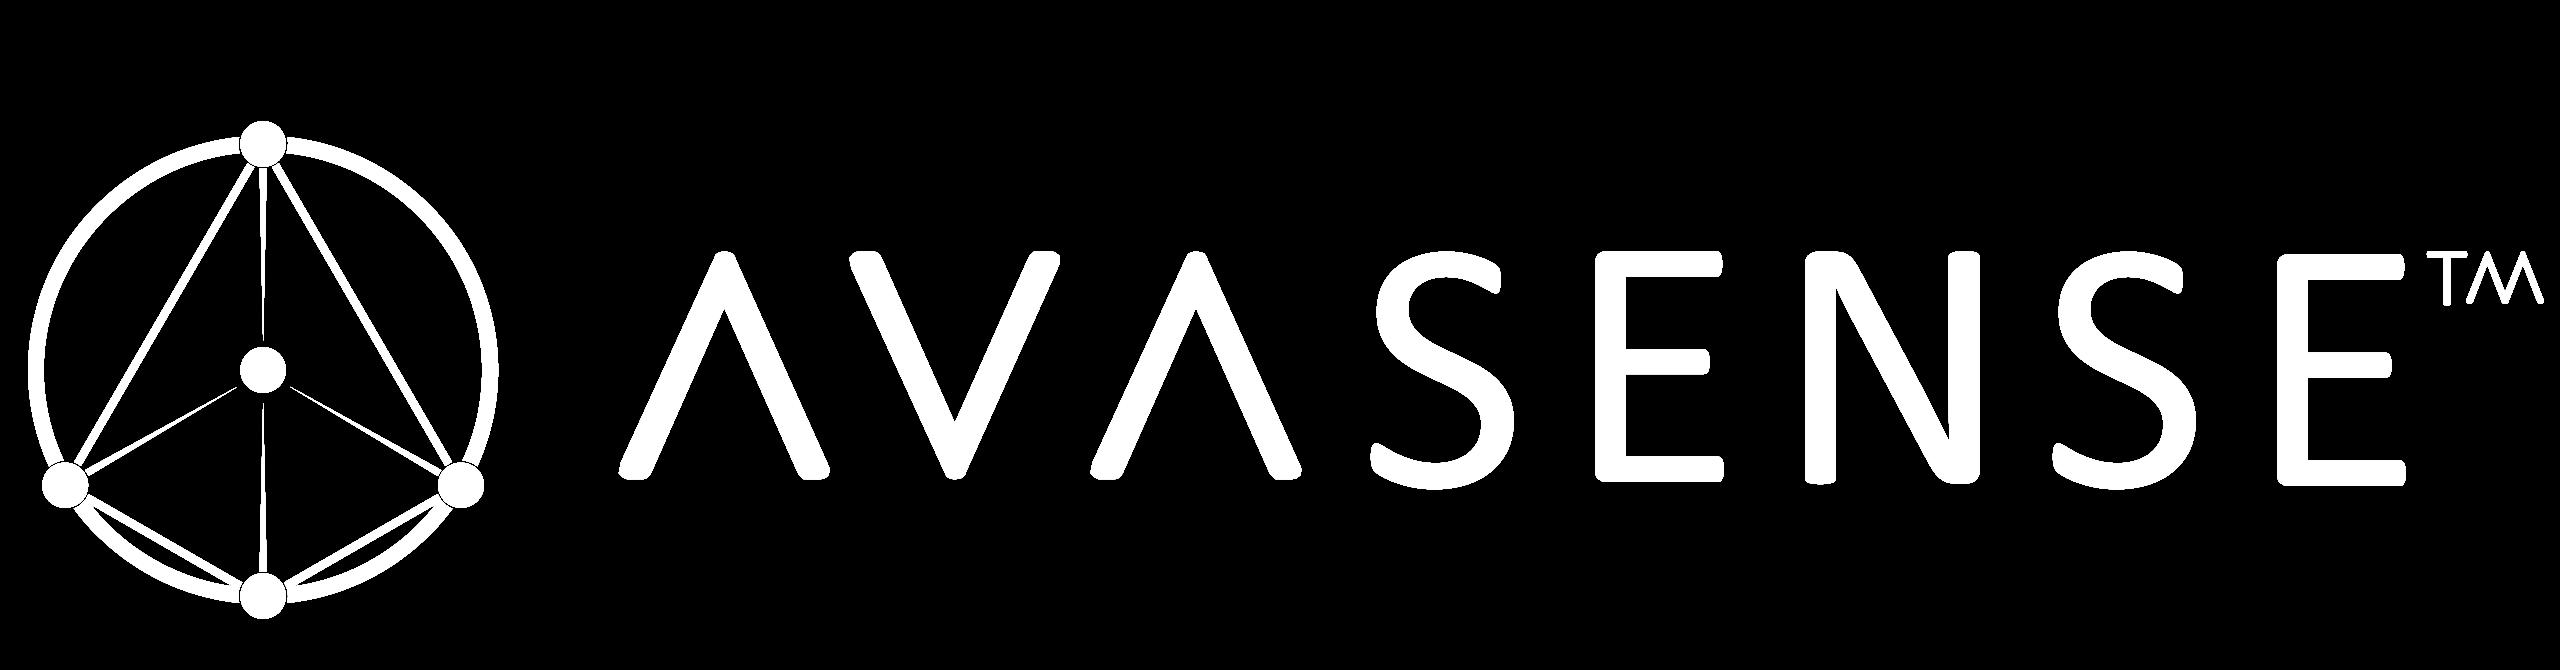 PNG WHITE AVASENSE cropped for web - AvaSense™